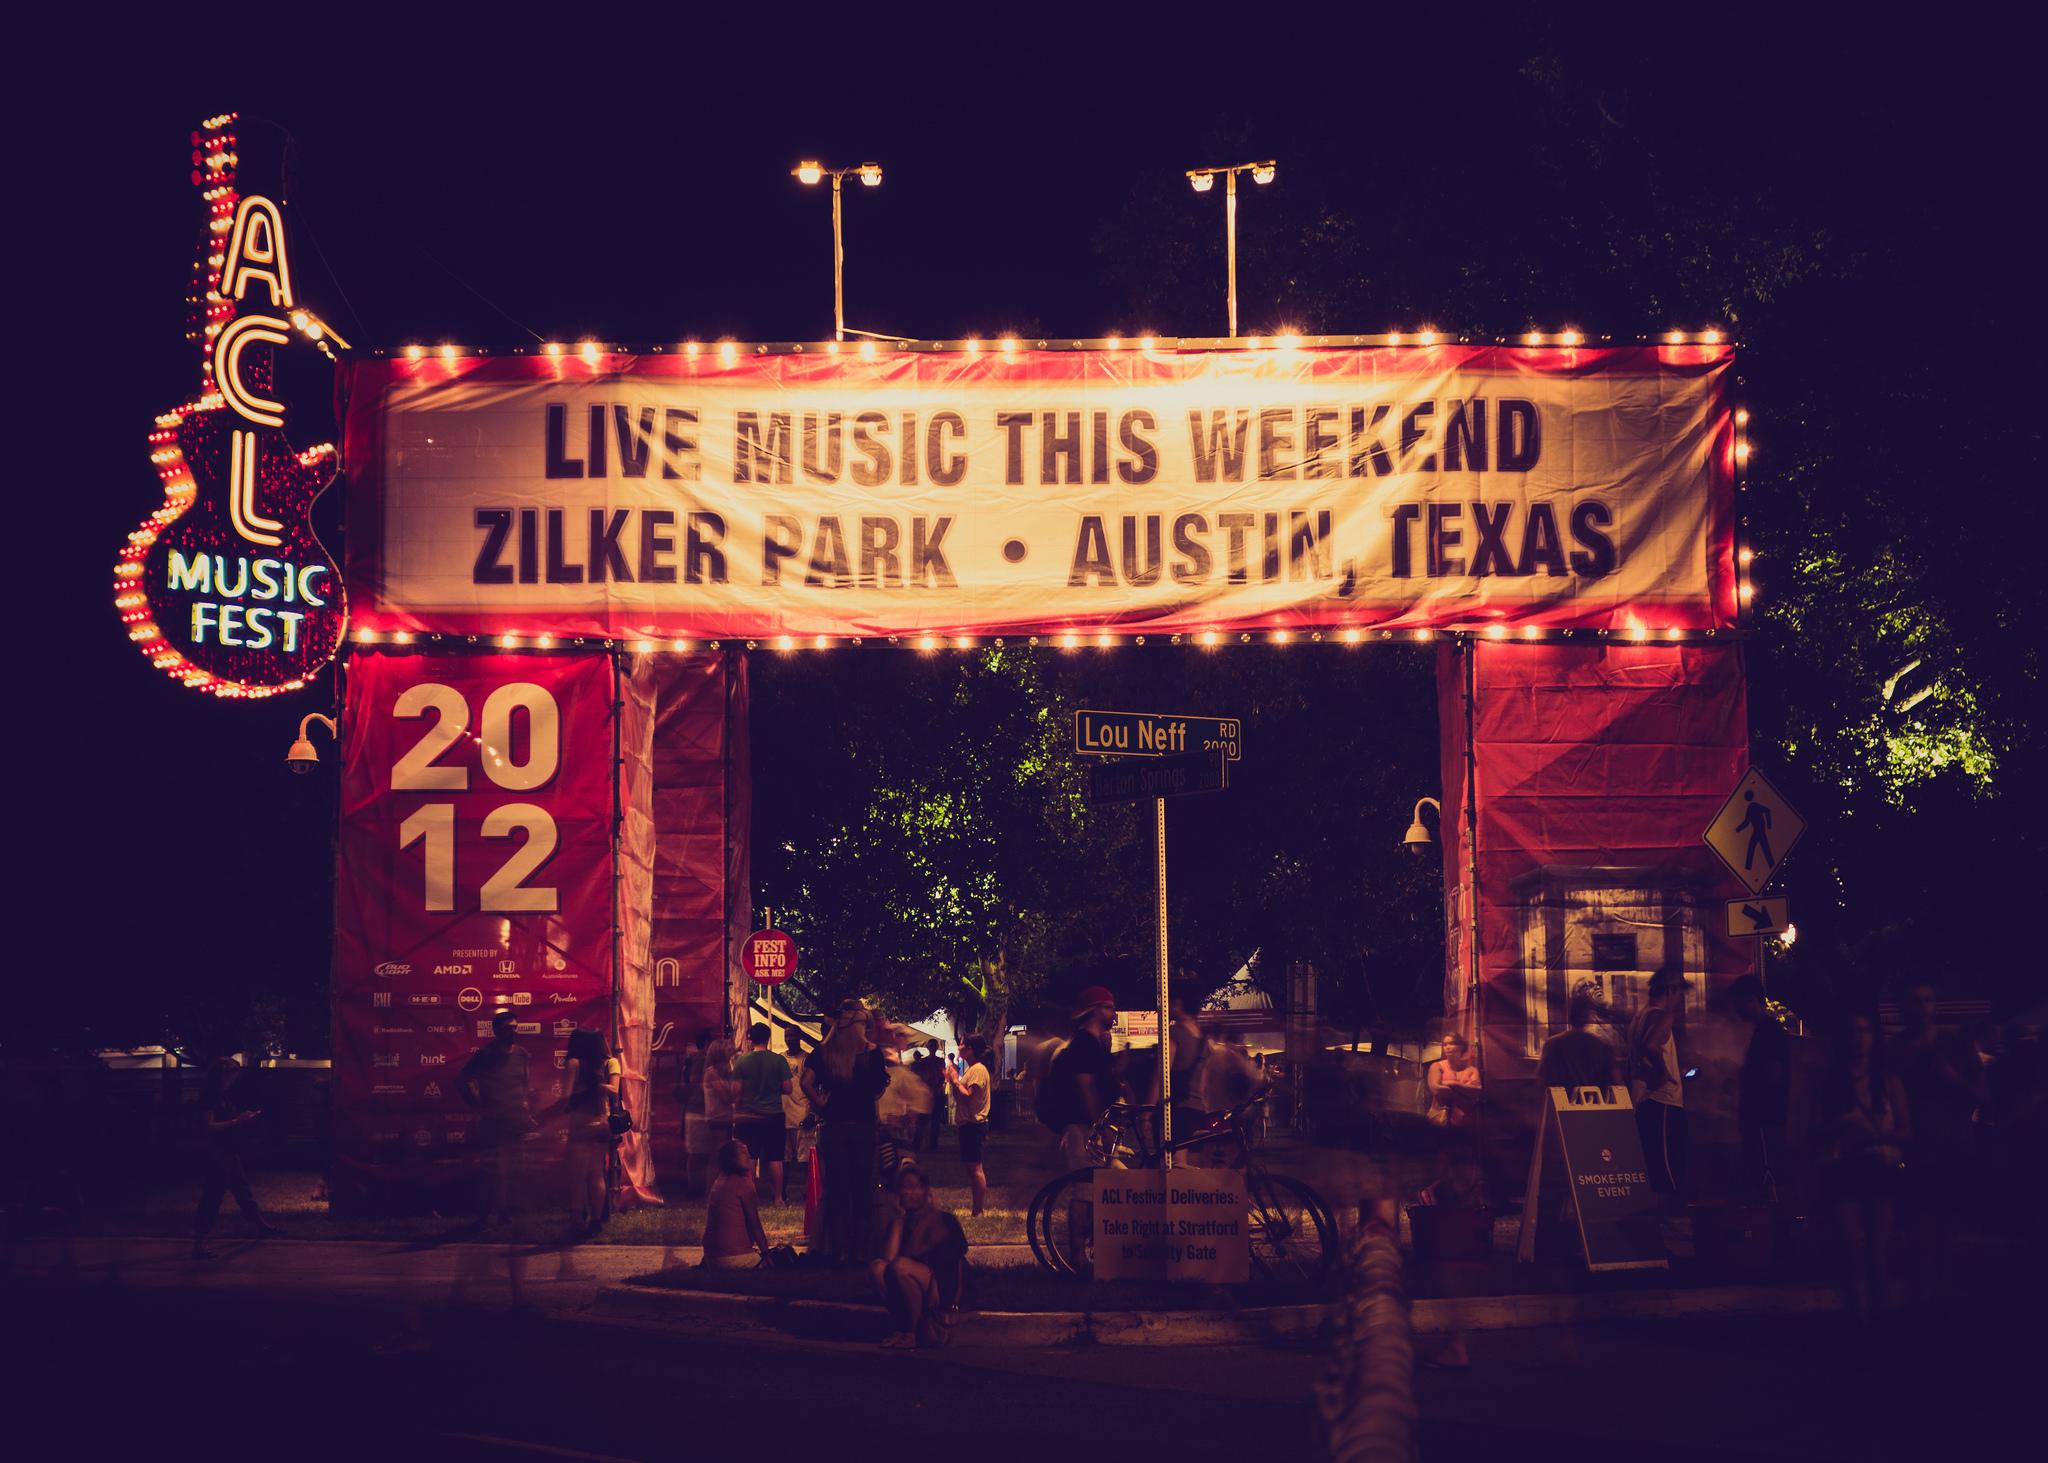 austin city limits live music festival austin texas atx banner arch 15th anniversary 2012 2016